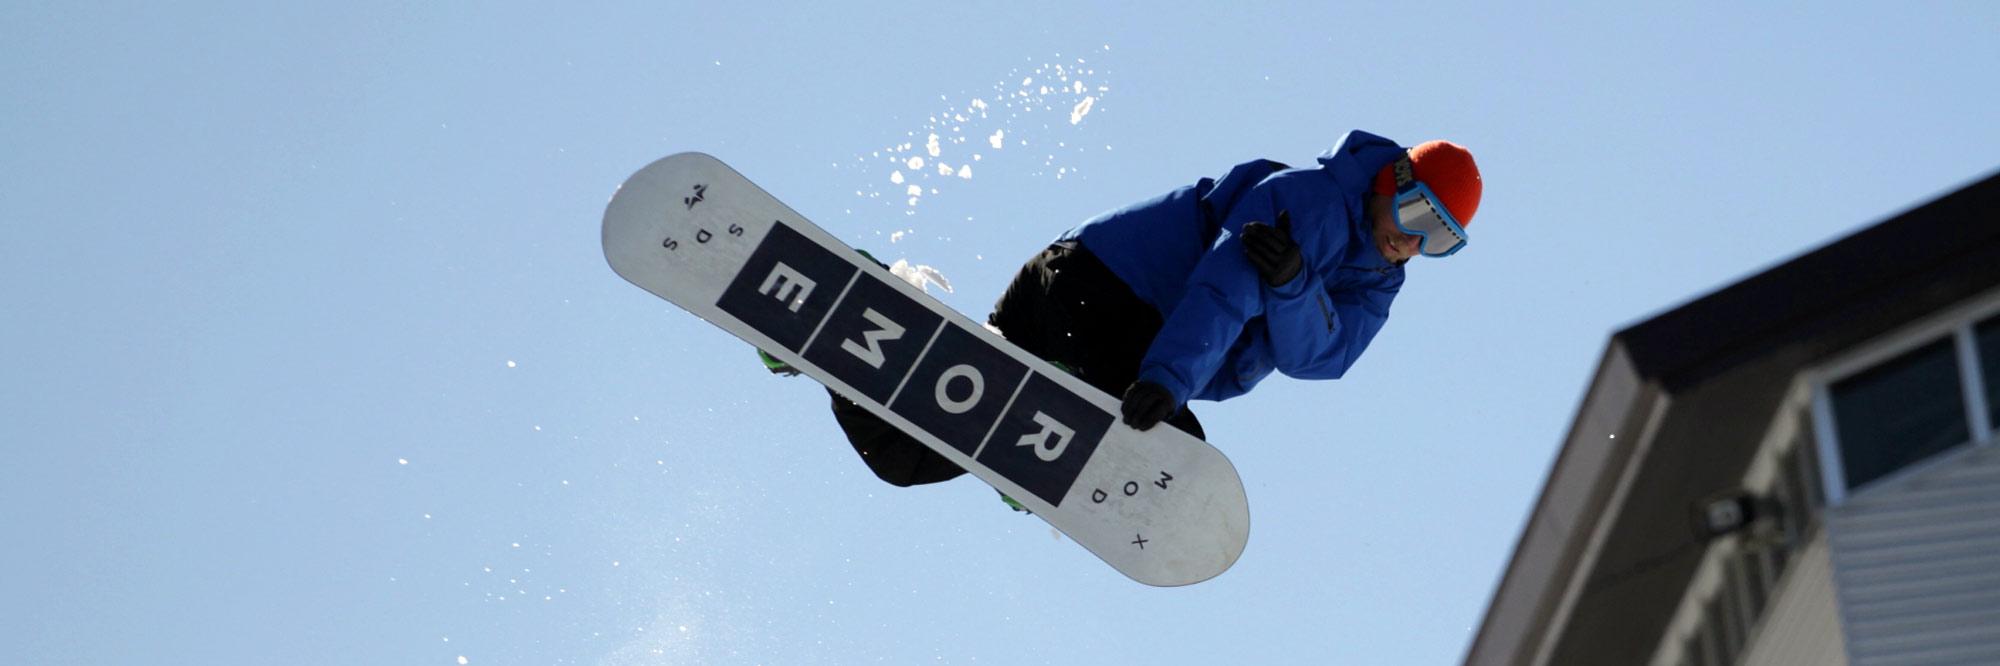 freestyle snowboarding in hakuba